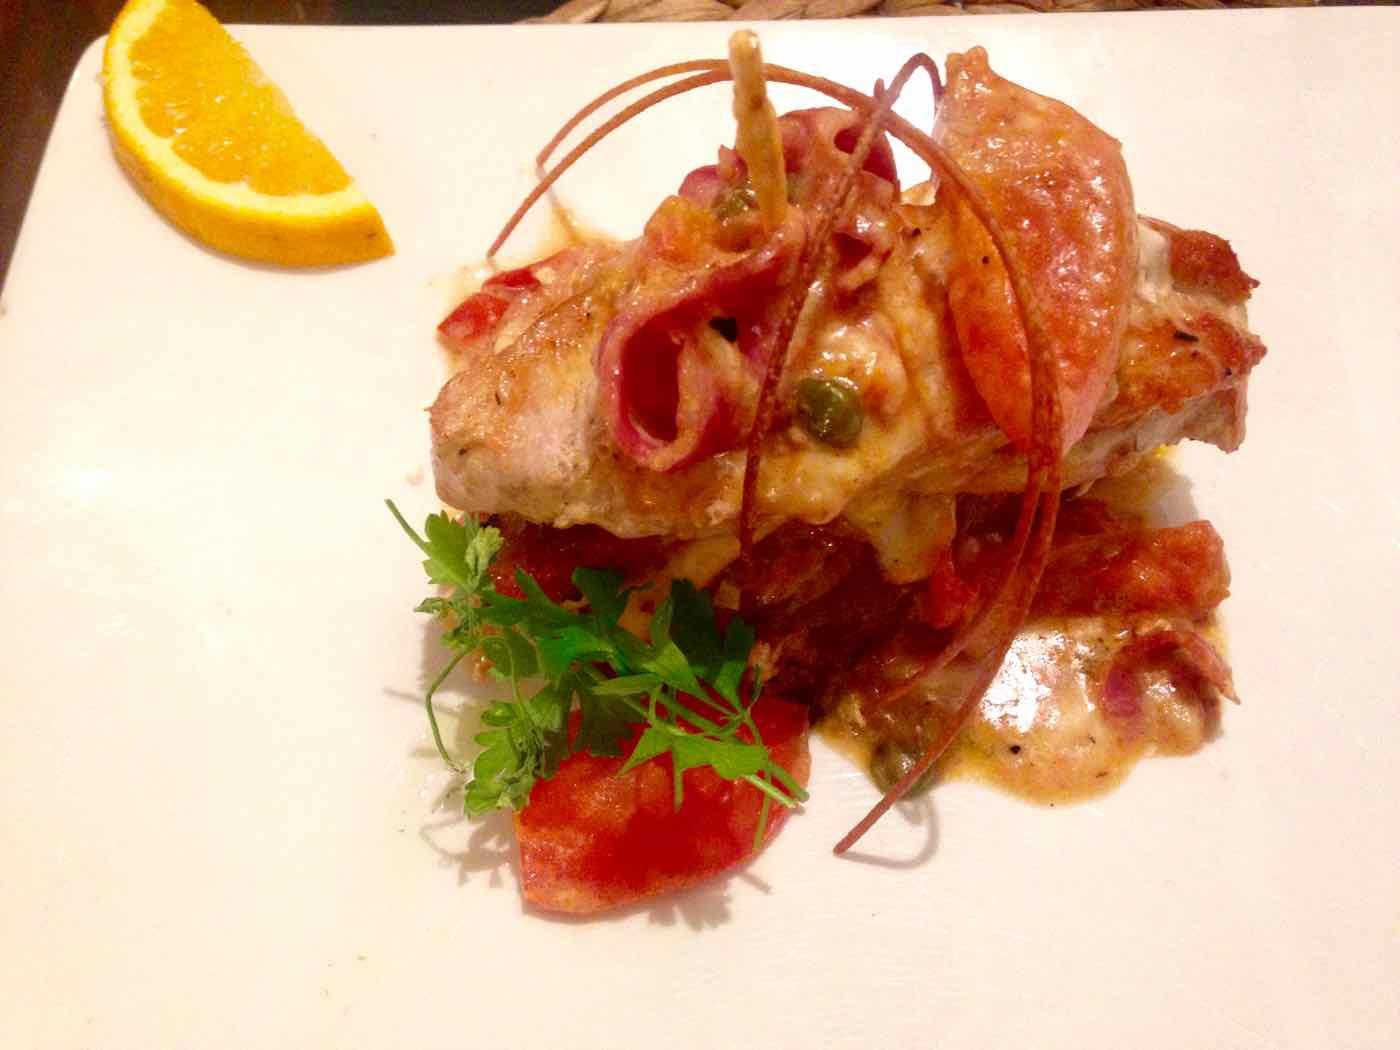 Turkey dish at Cocina Puerto